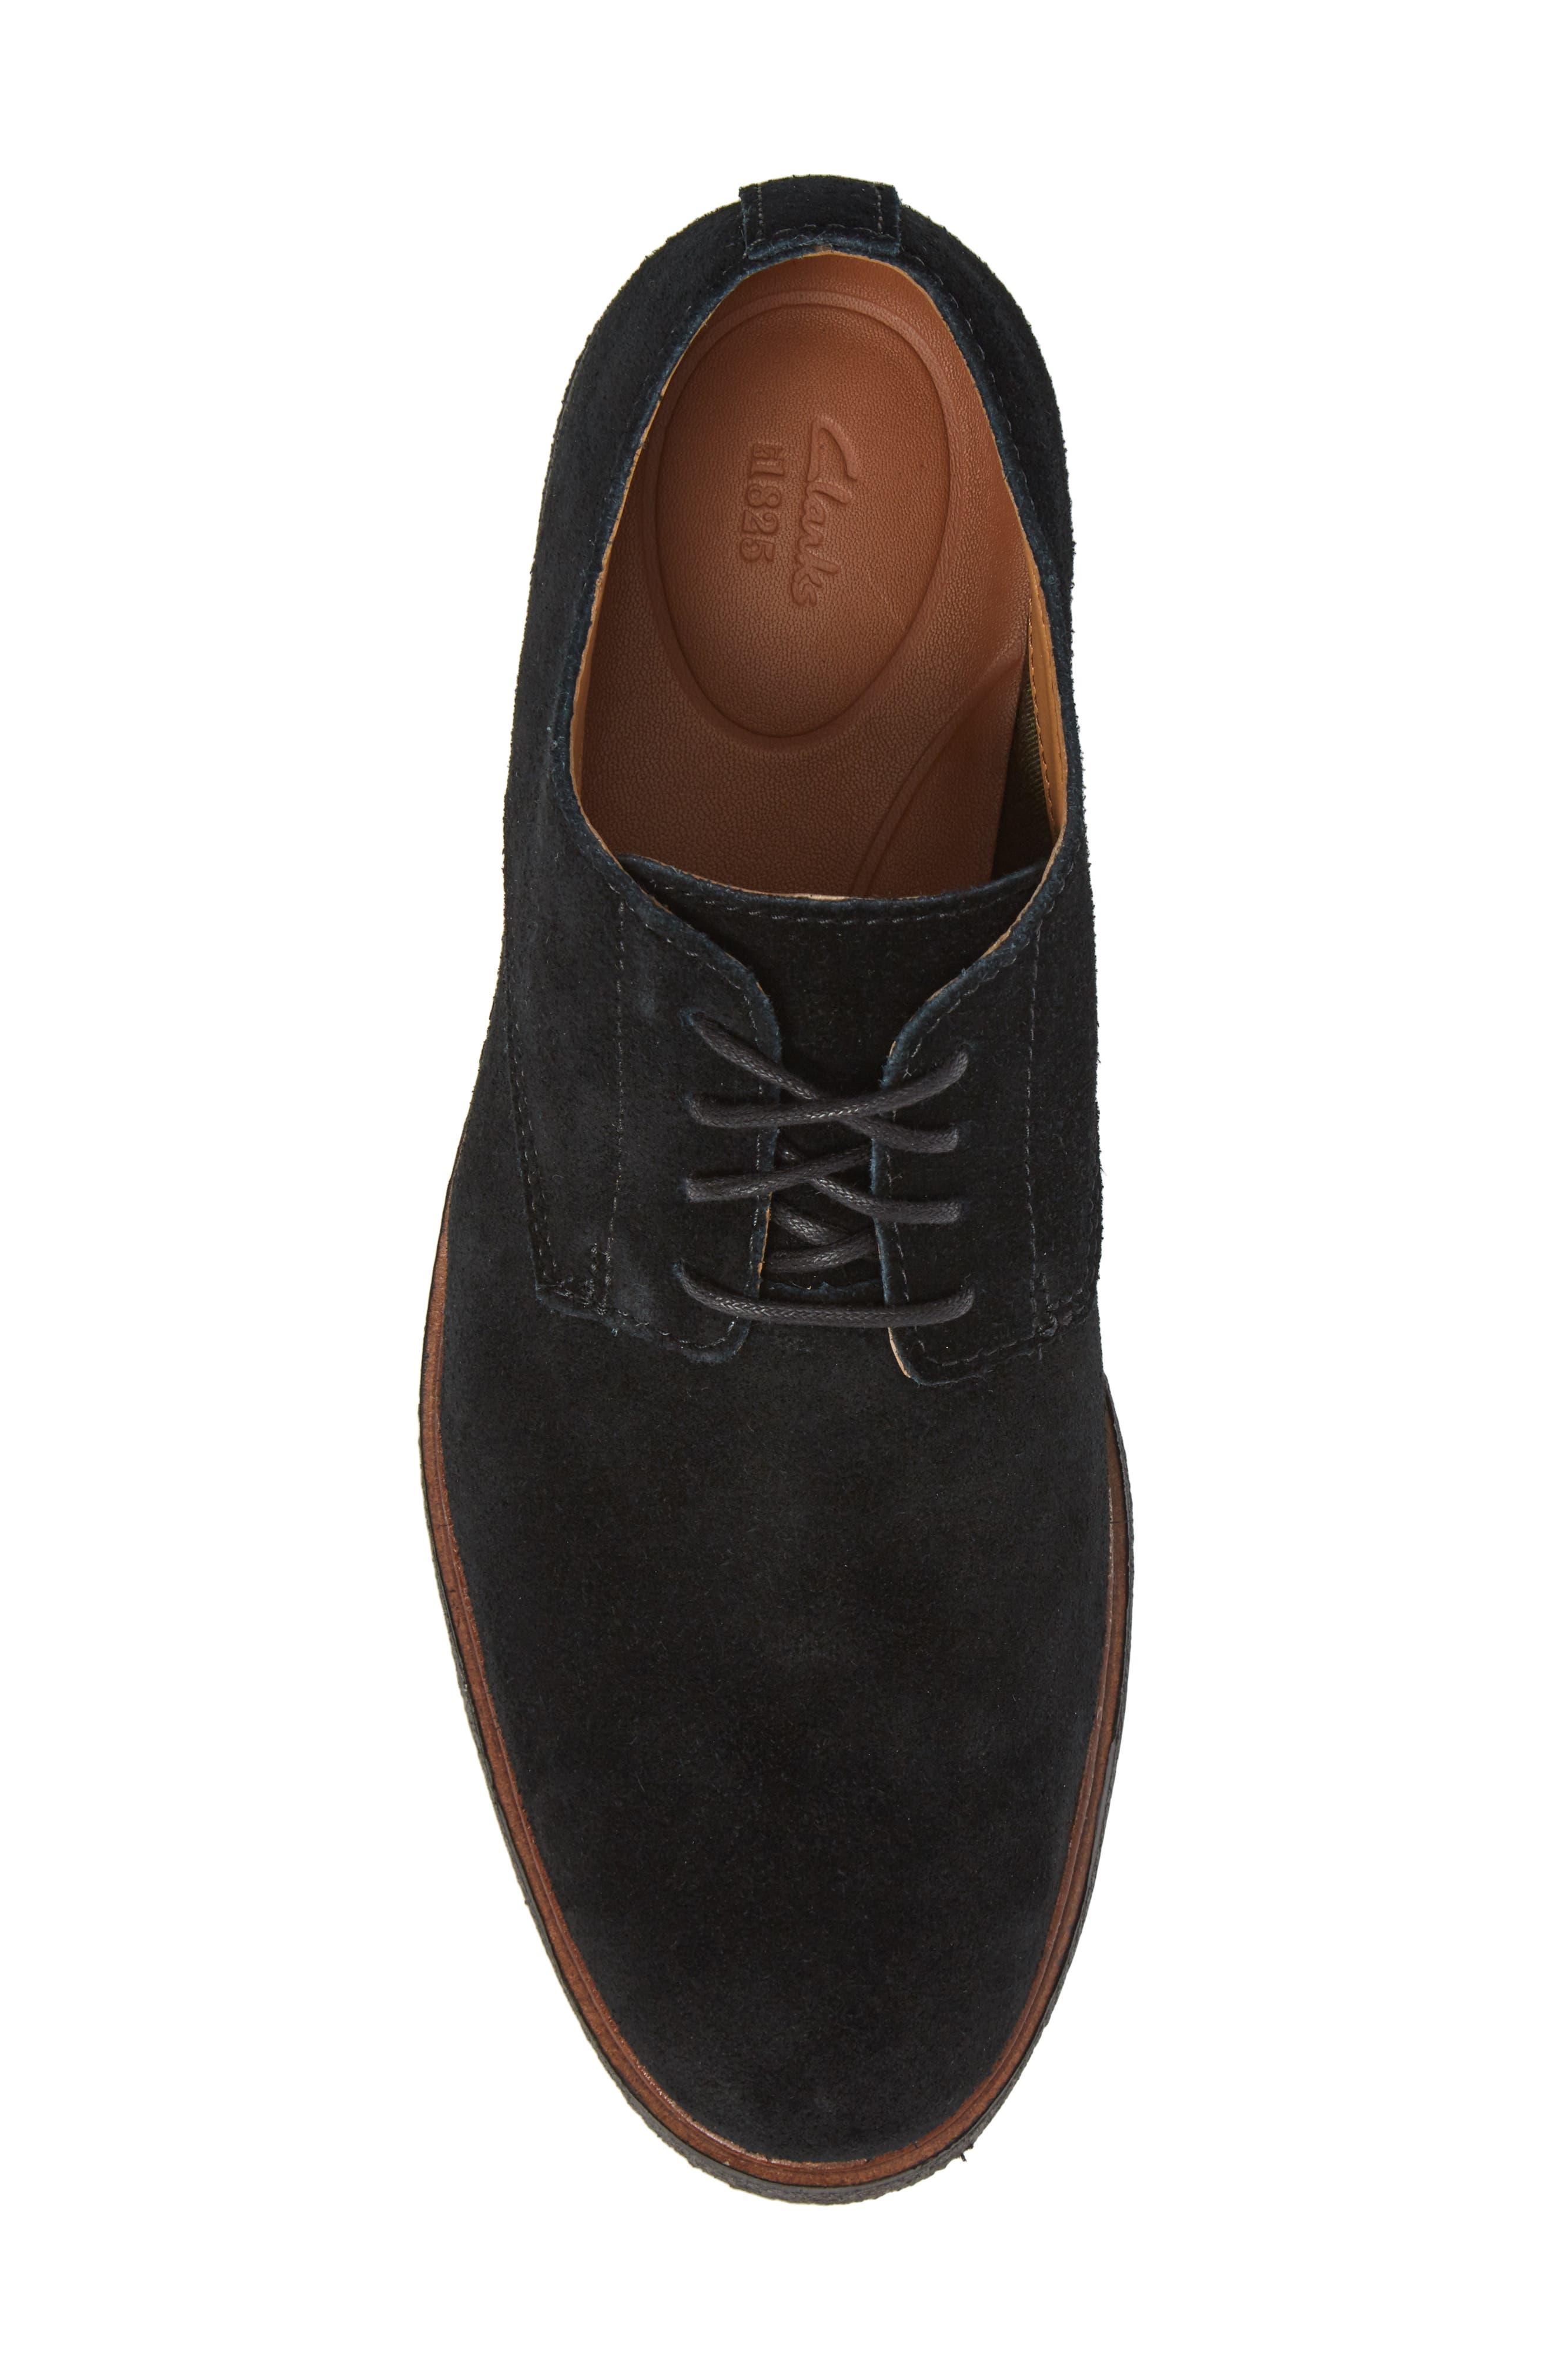 Clarks Clarkdale Moon Buck Shoe,                             Alternate thumbnail 5, color,                             Black Suede